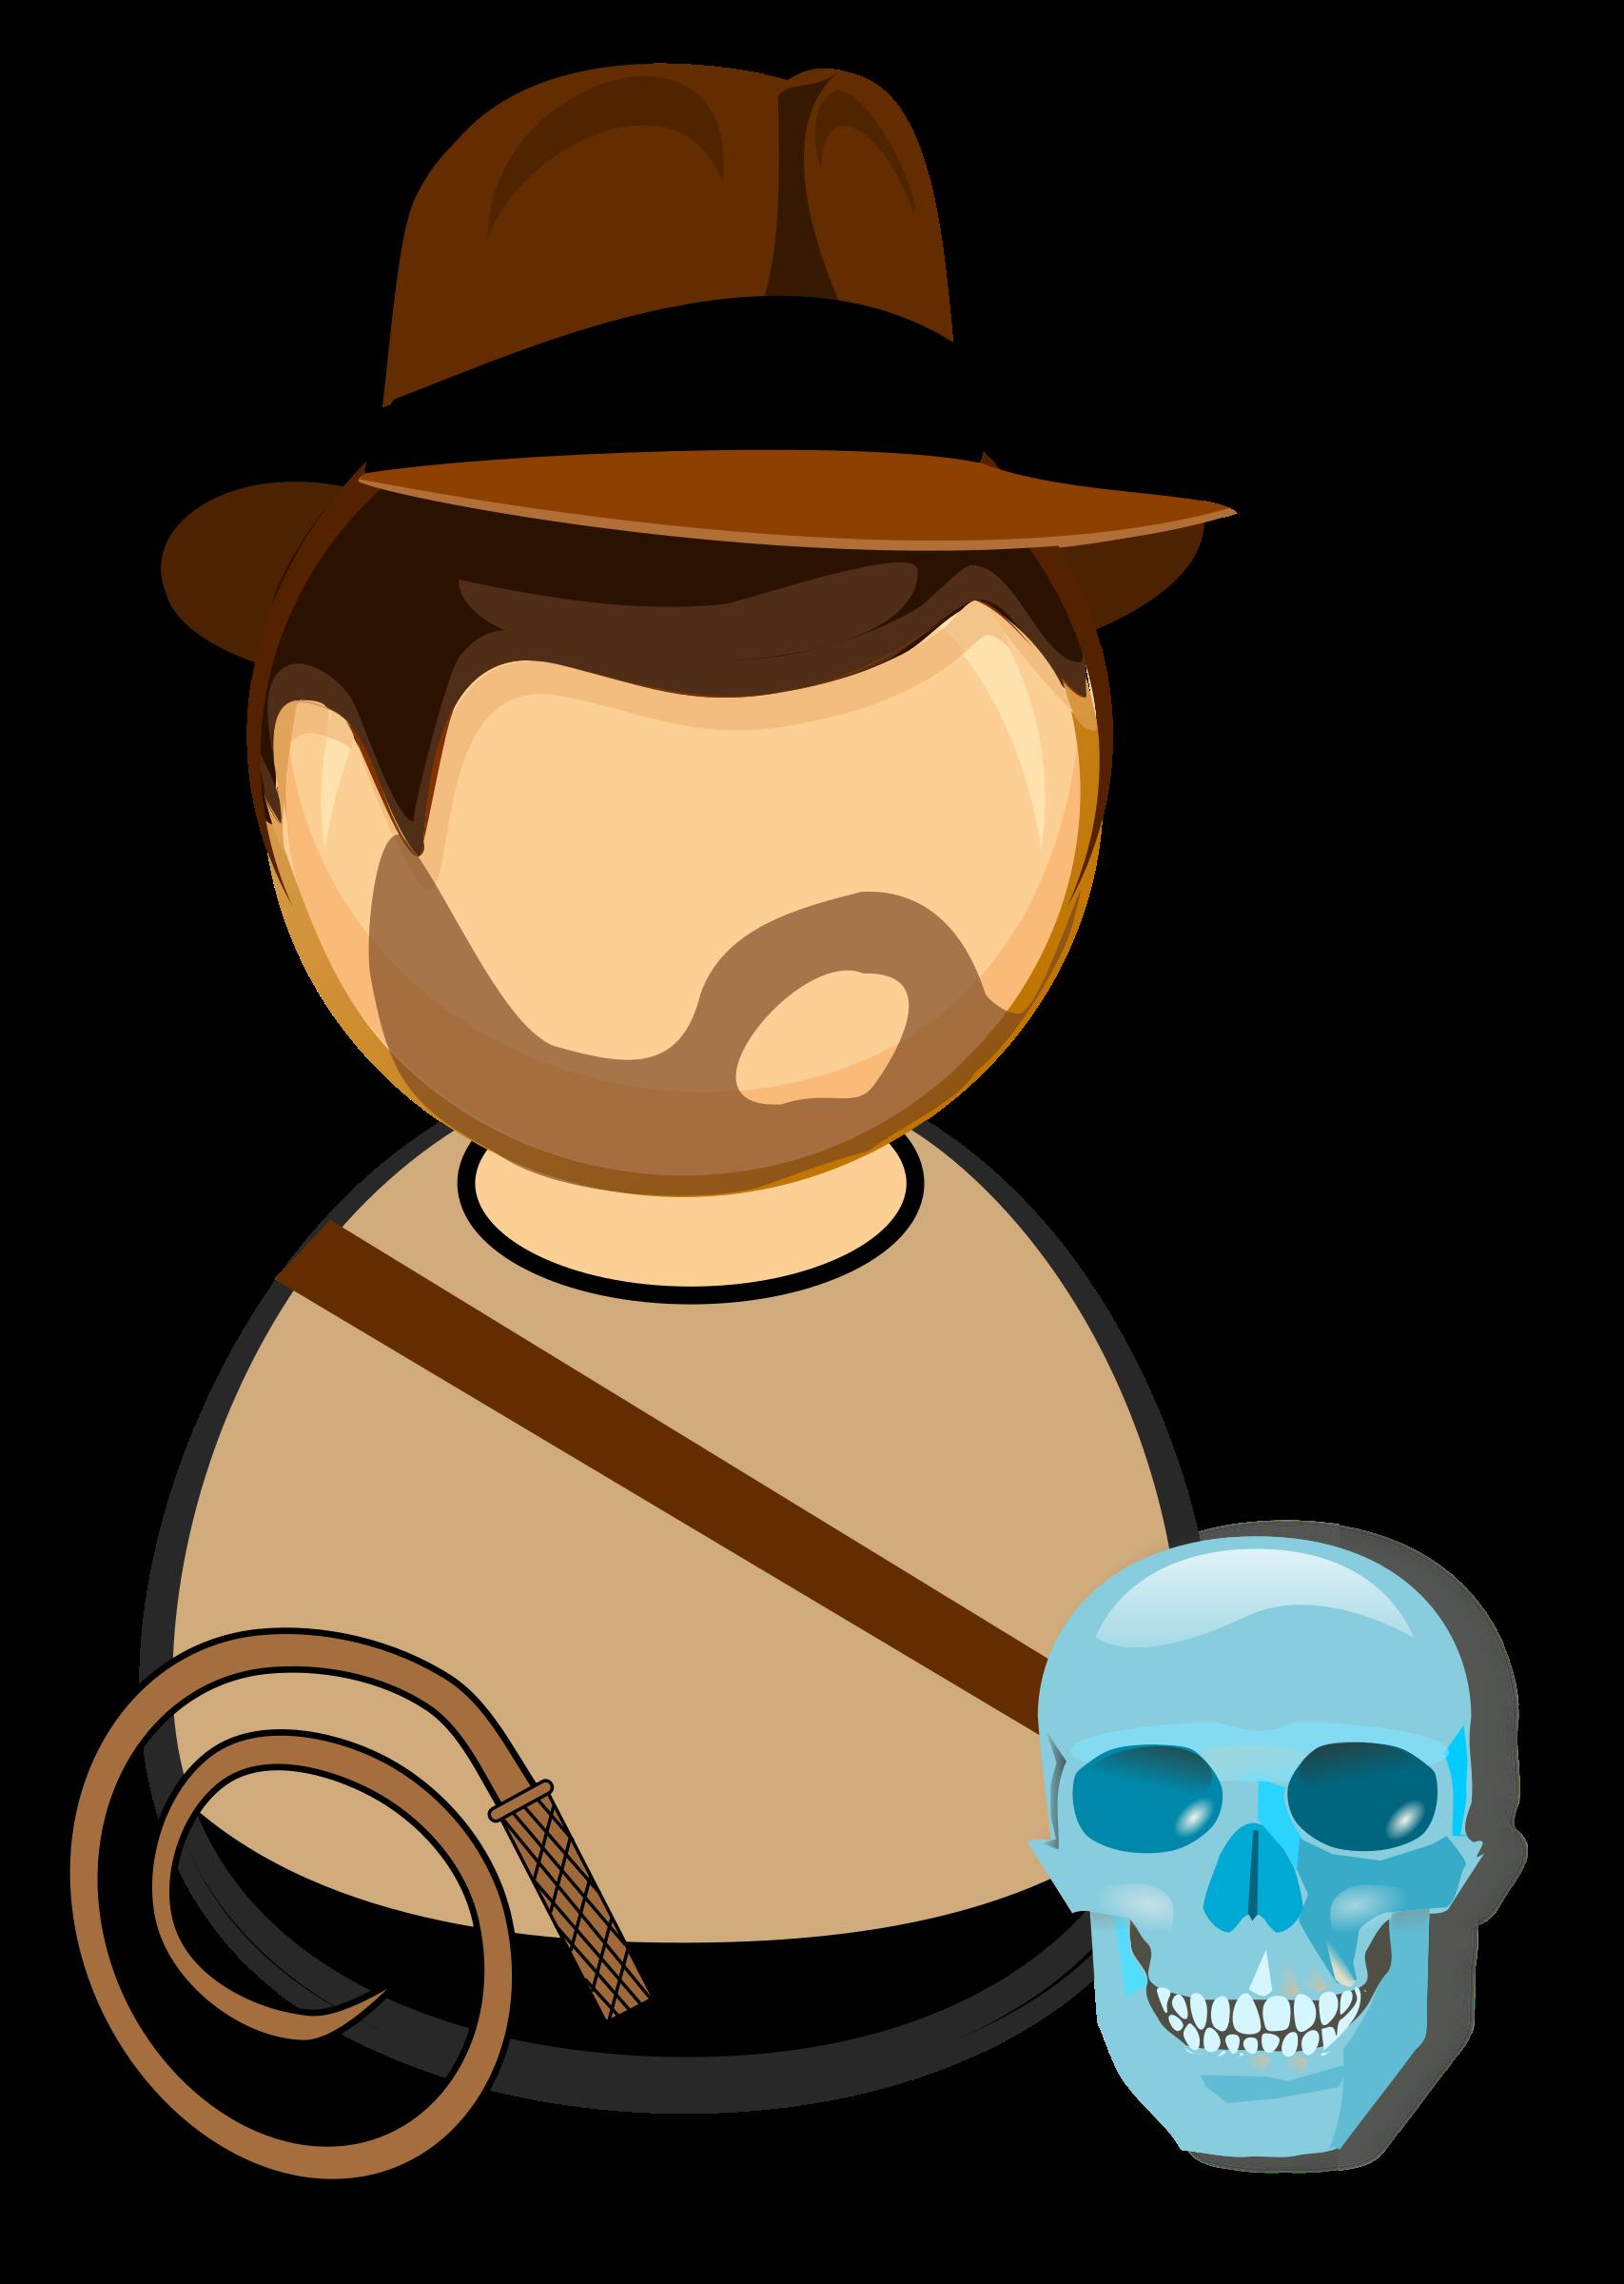 vector transparent download Adventurer in a hat. Whip clipart cartoon